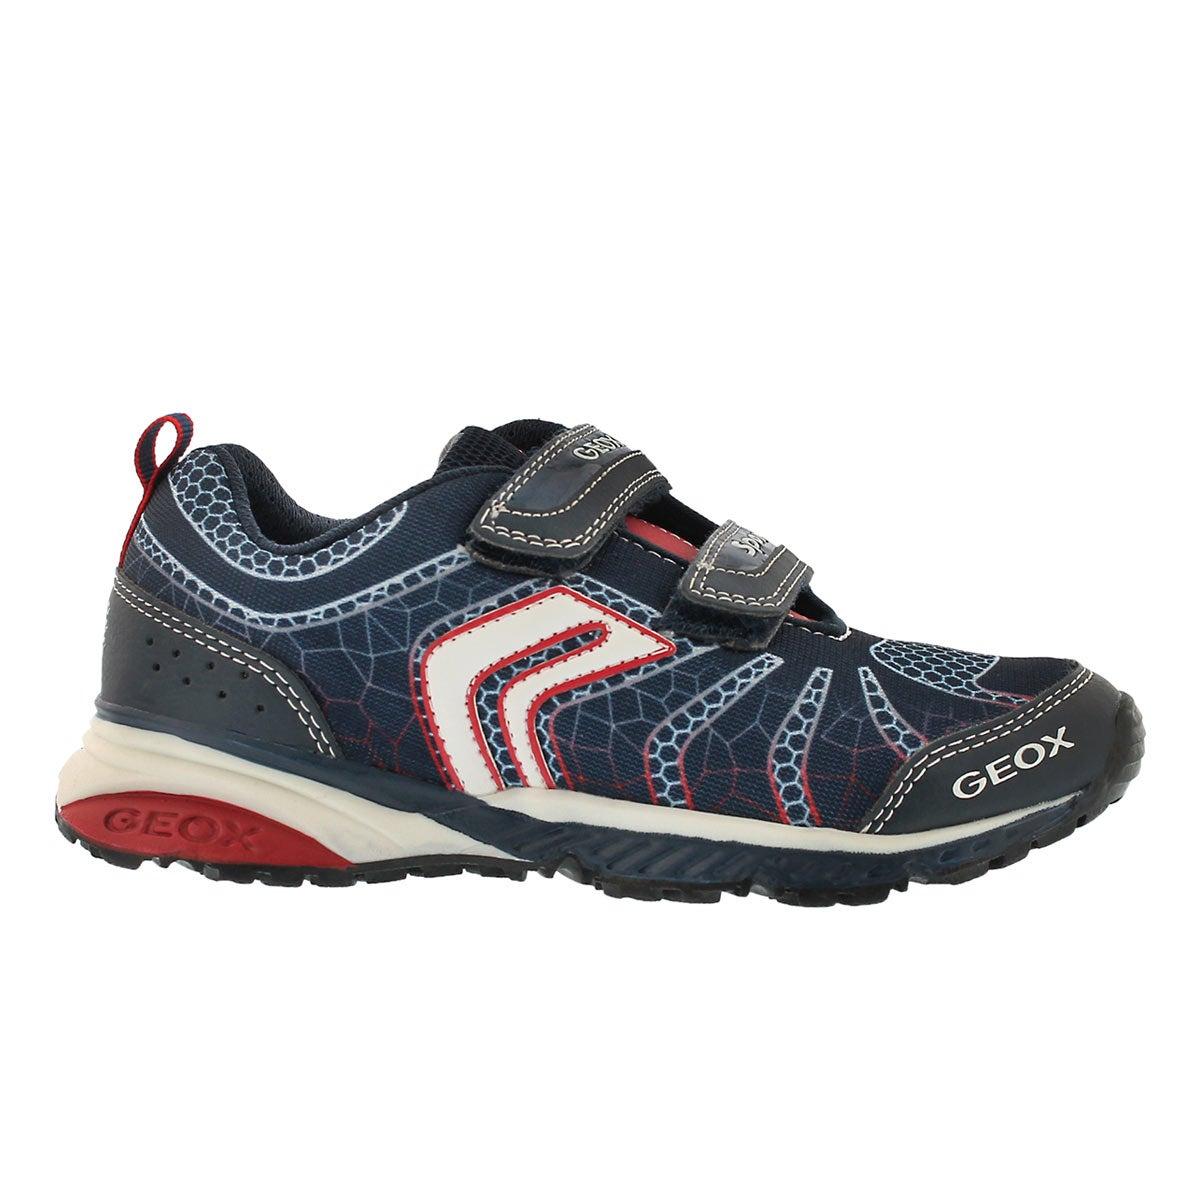 Geox Boys Tennis Shoes